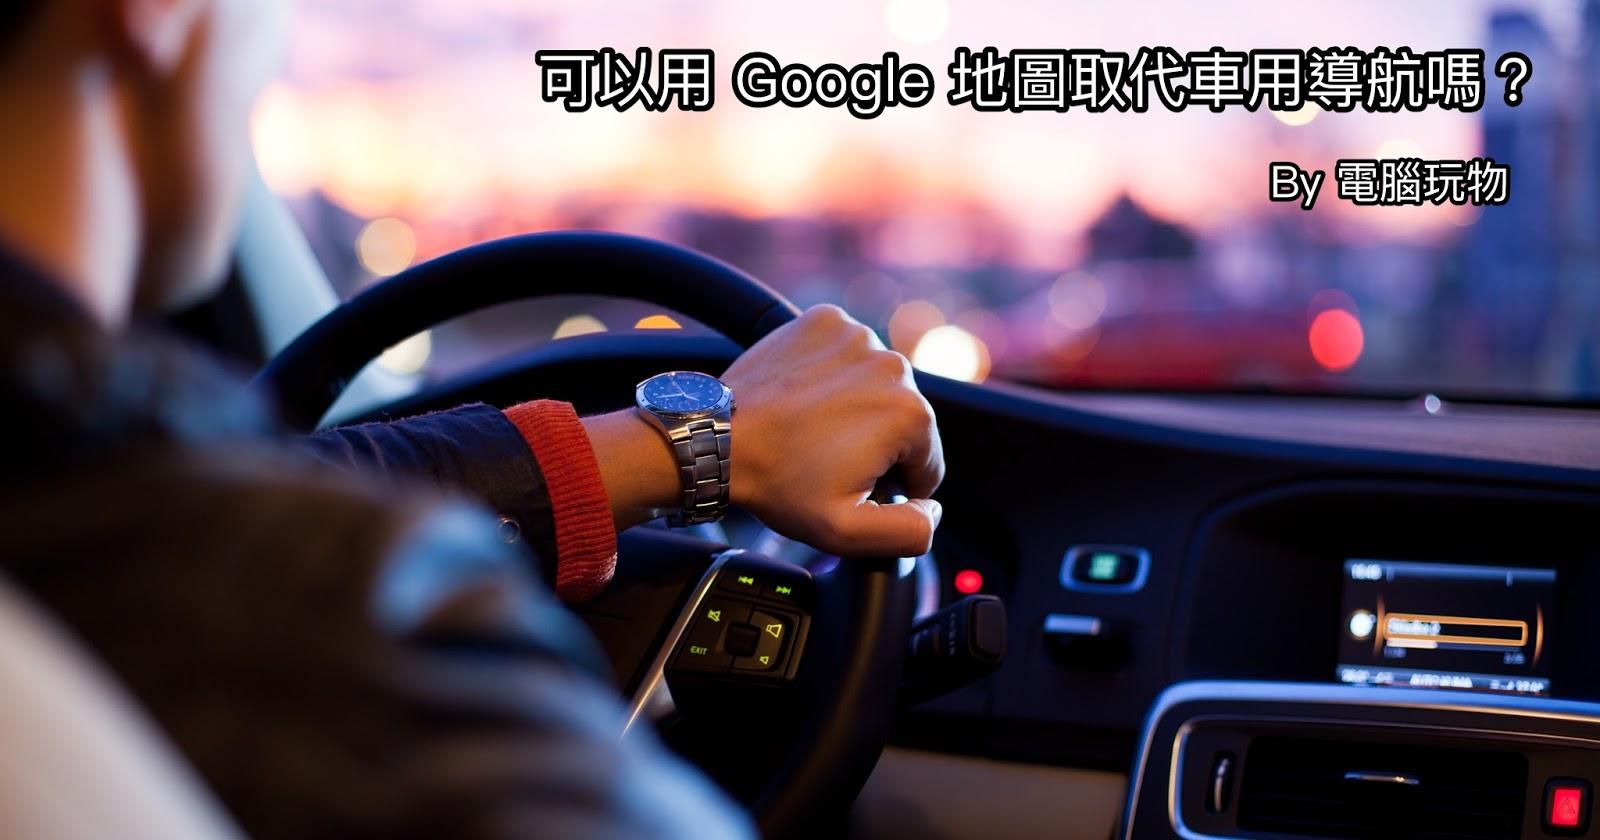 Google 地圖手機導航 App 取代車用導航夠用嗎?我的實測心得